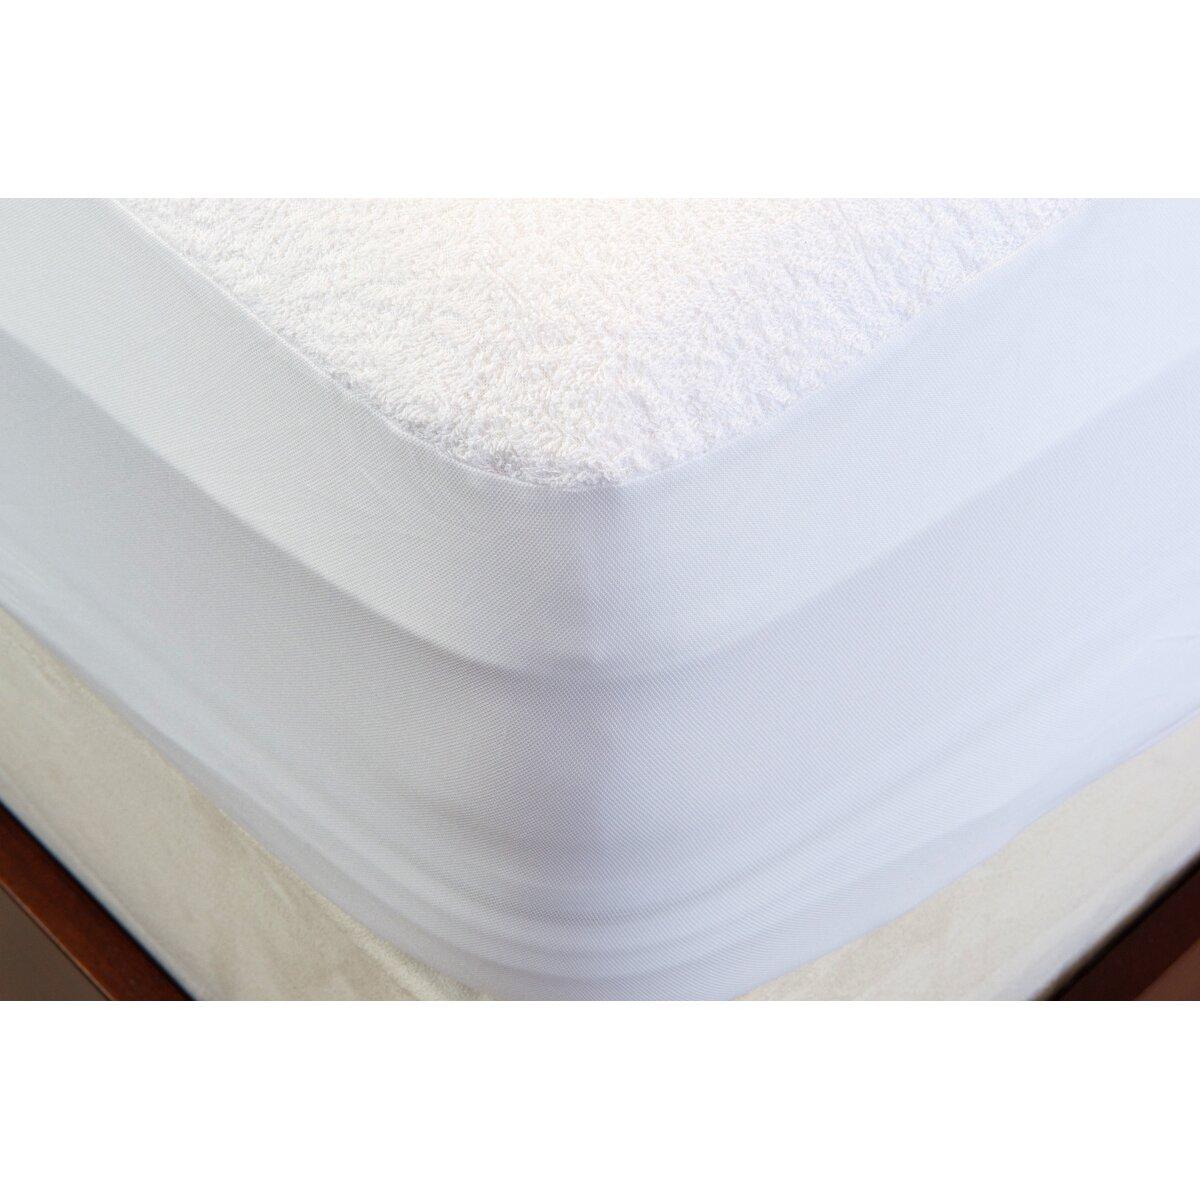 Mezzati Hypoallergenic Waterproof Mattress Protector